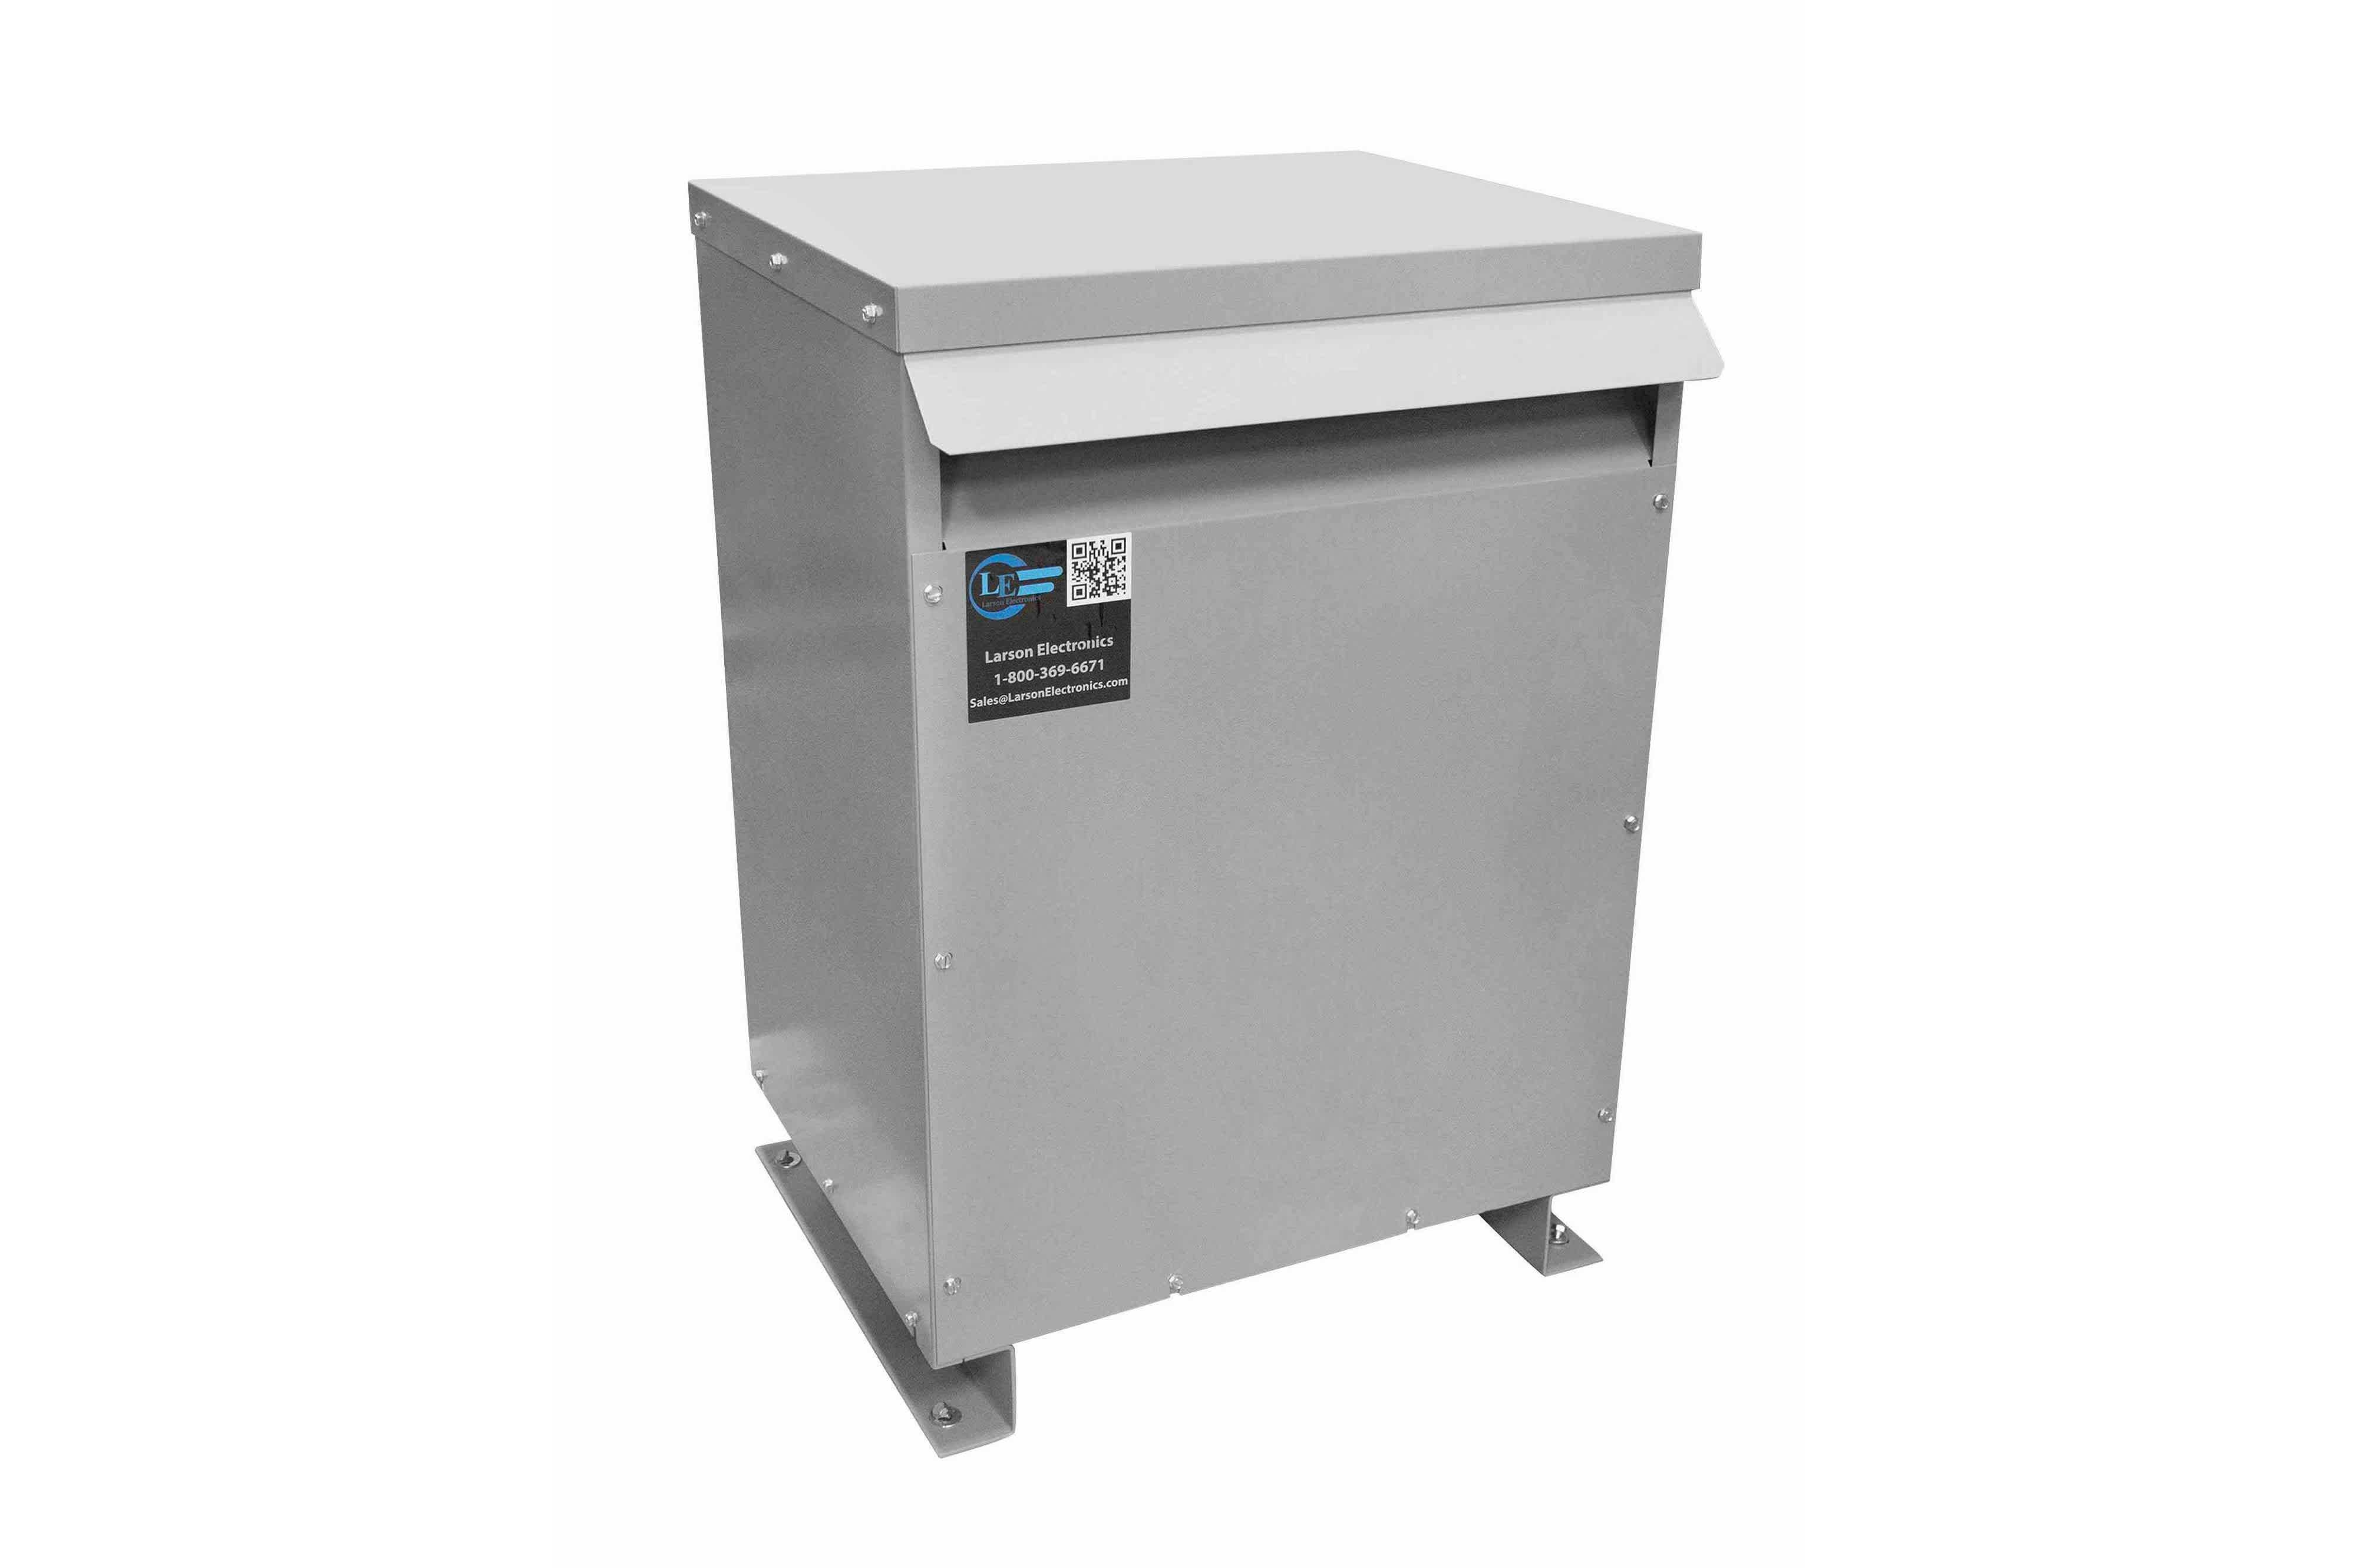 115 kVA 3PH Isolation Transformer, 460V Wye Primary, 240V Delta Secondary, N3R, Ventilated, 60 Hz